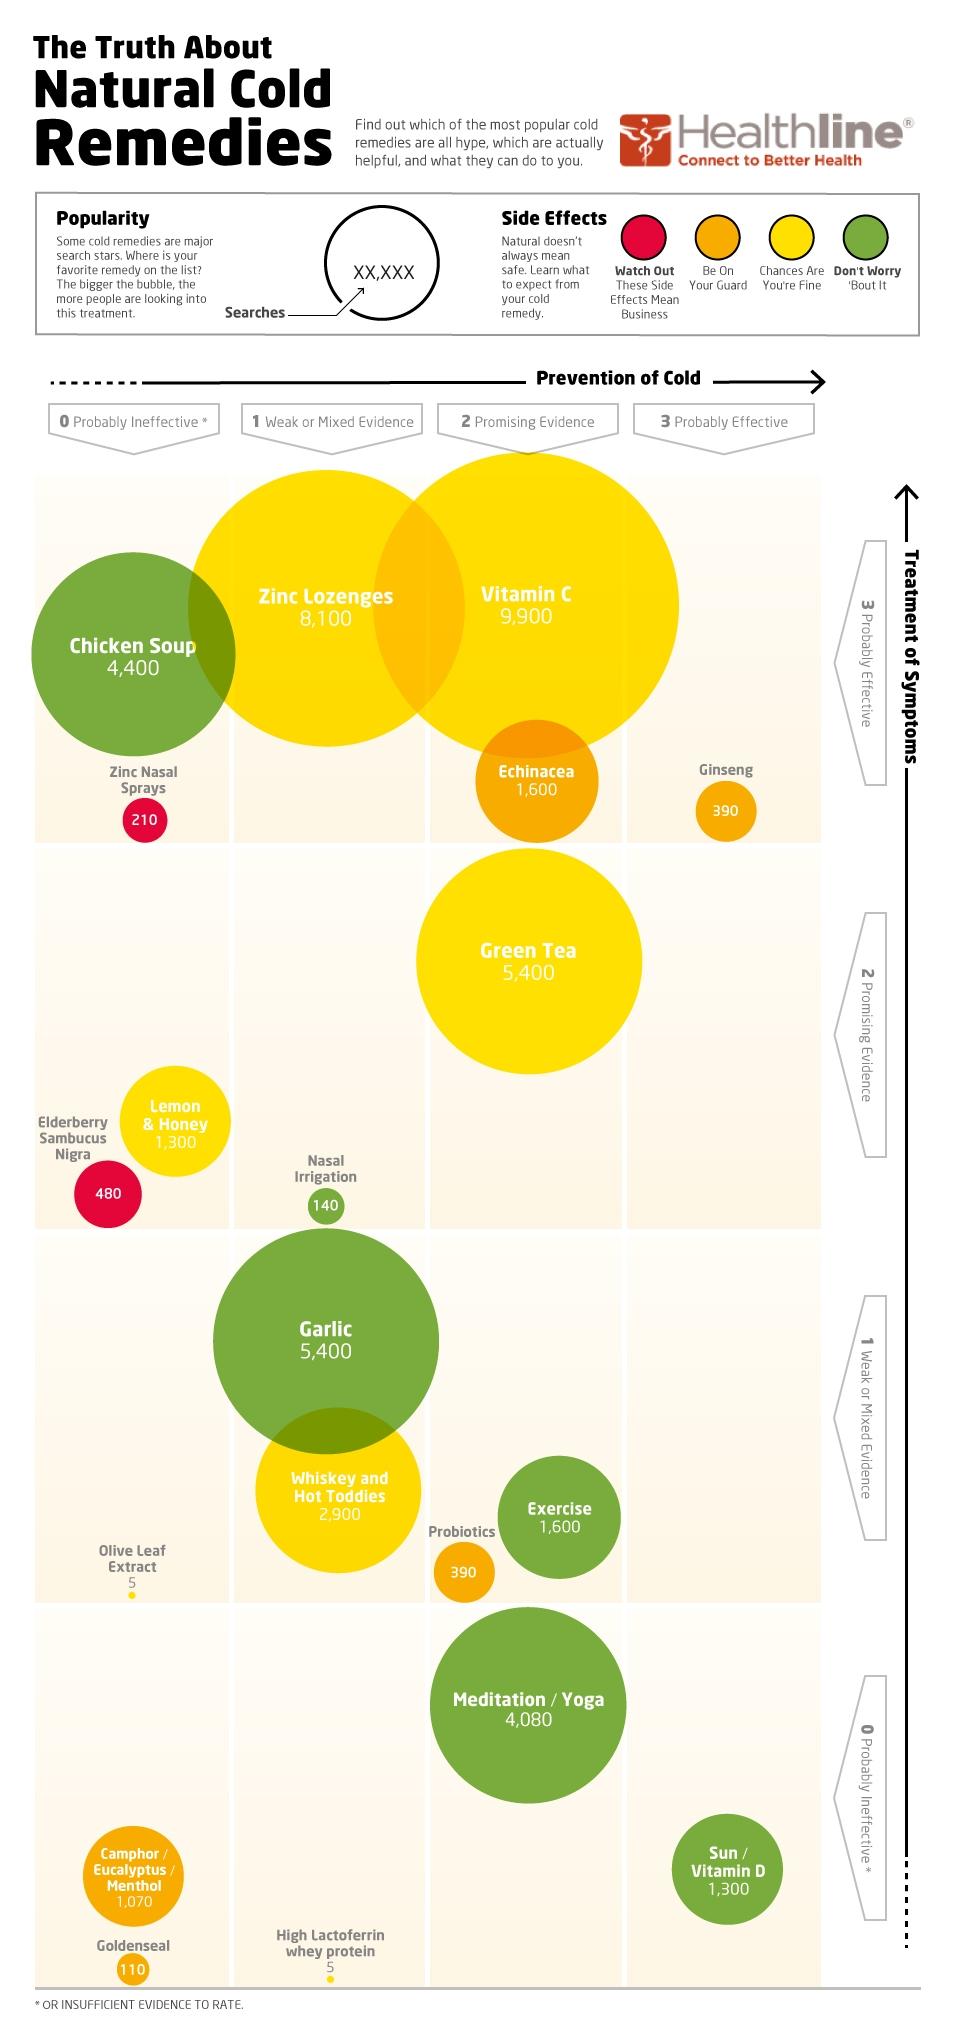 Most popular infographic topics